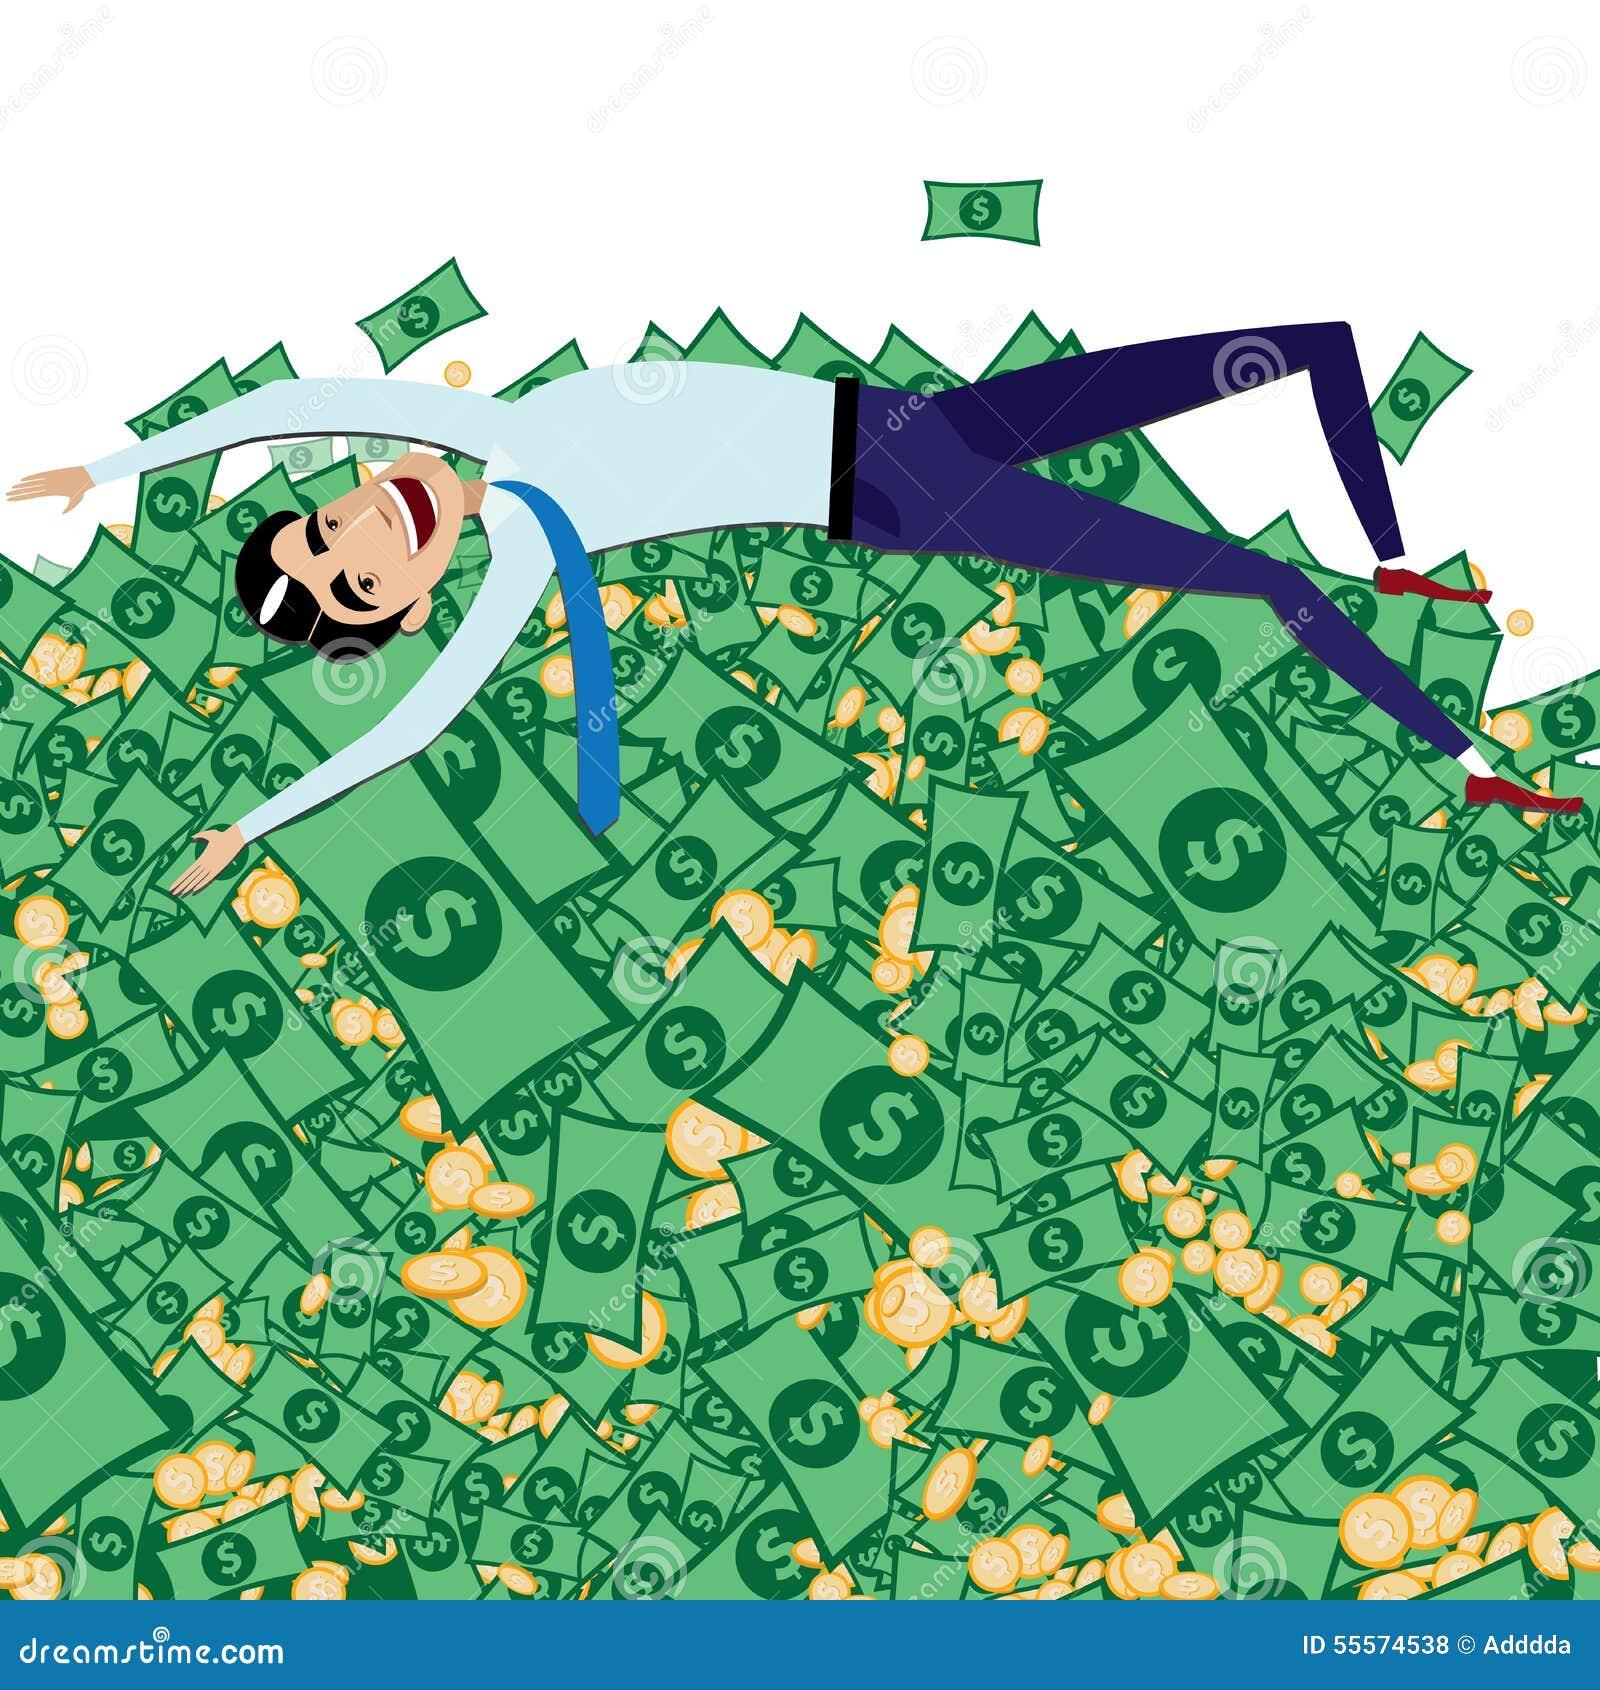 happy businessman lying on big pile of money stock illustration rh dreamstime com Money in Hand Clip Art Money Clip Art Black and White